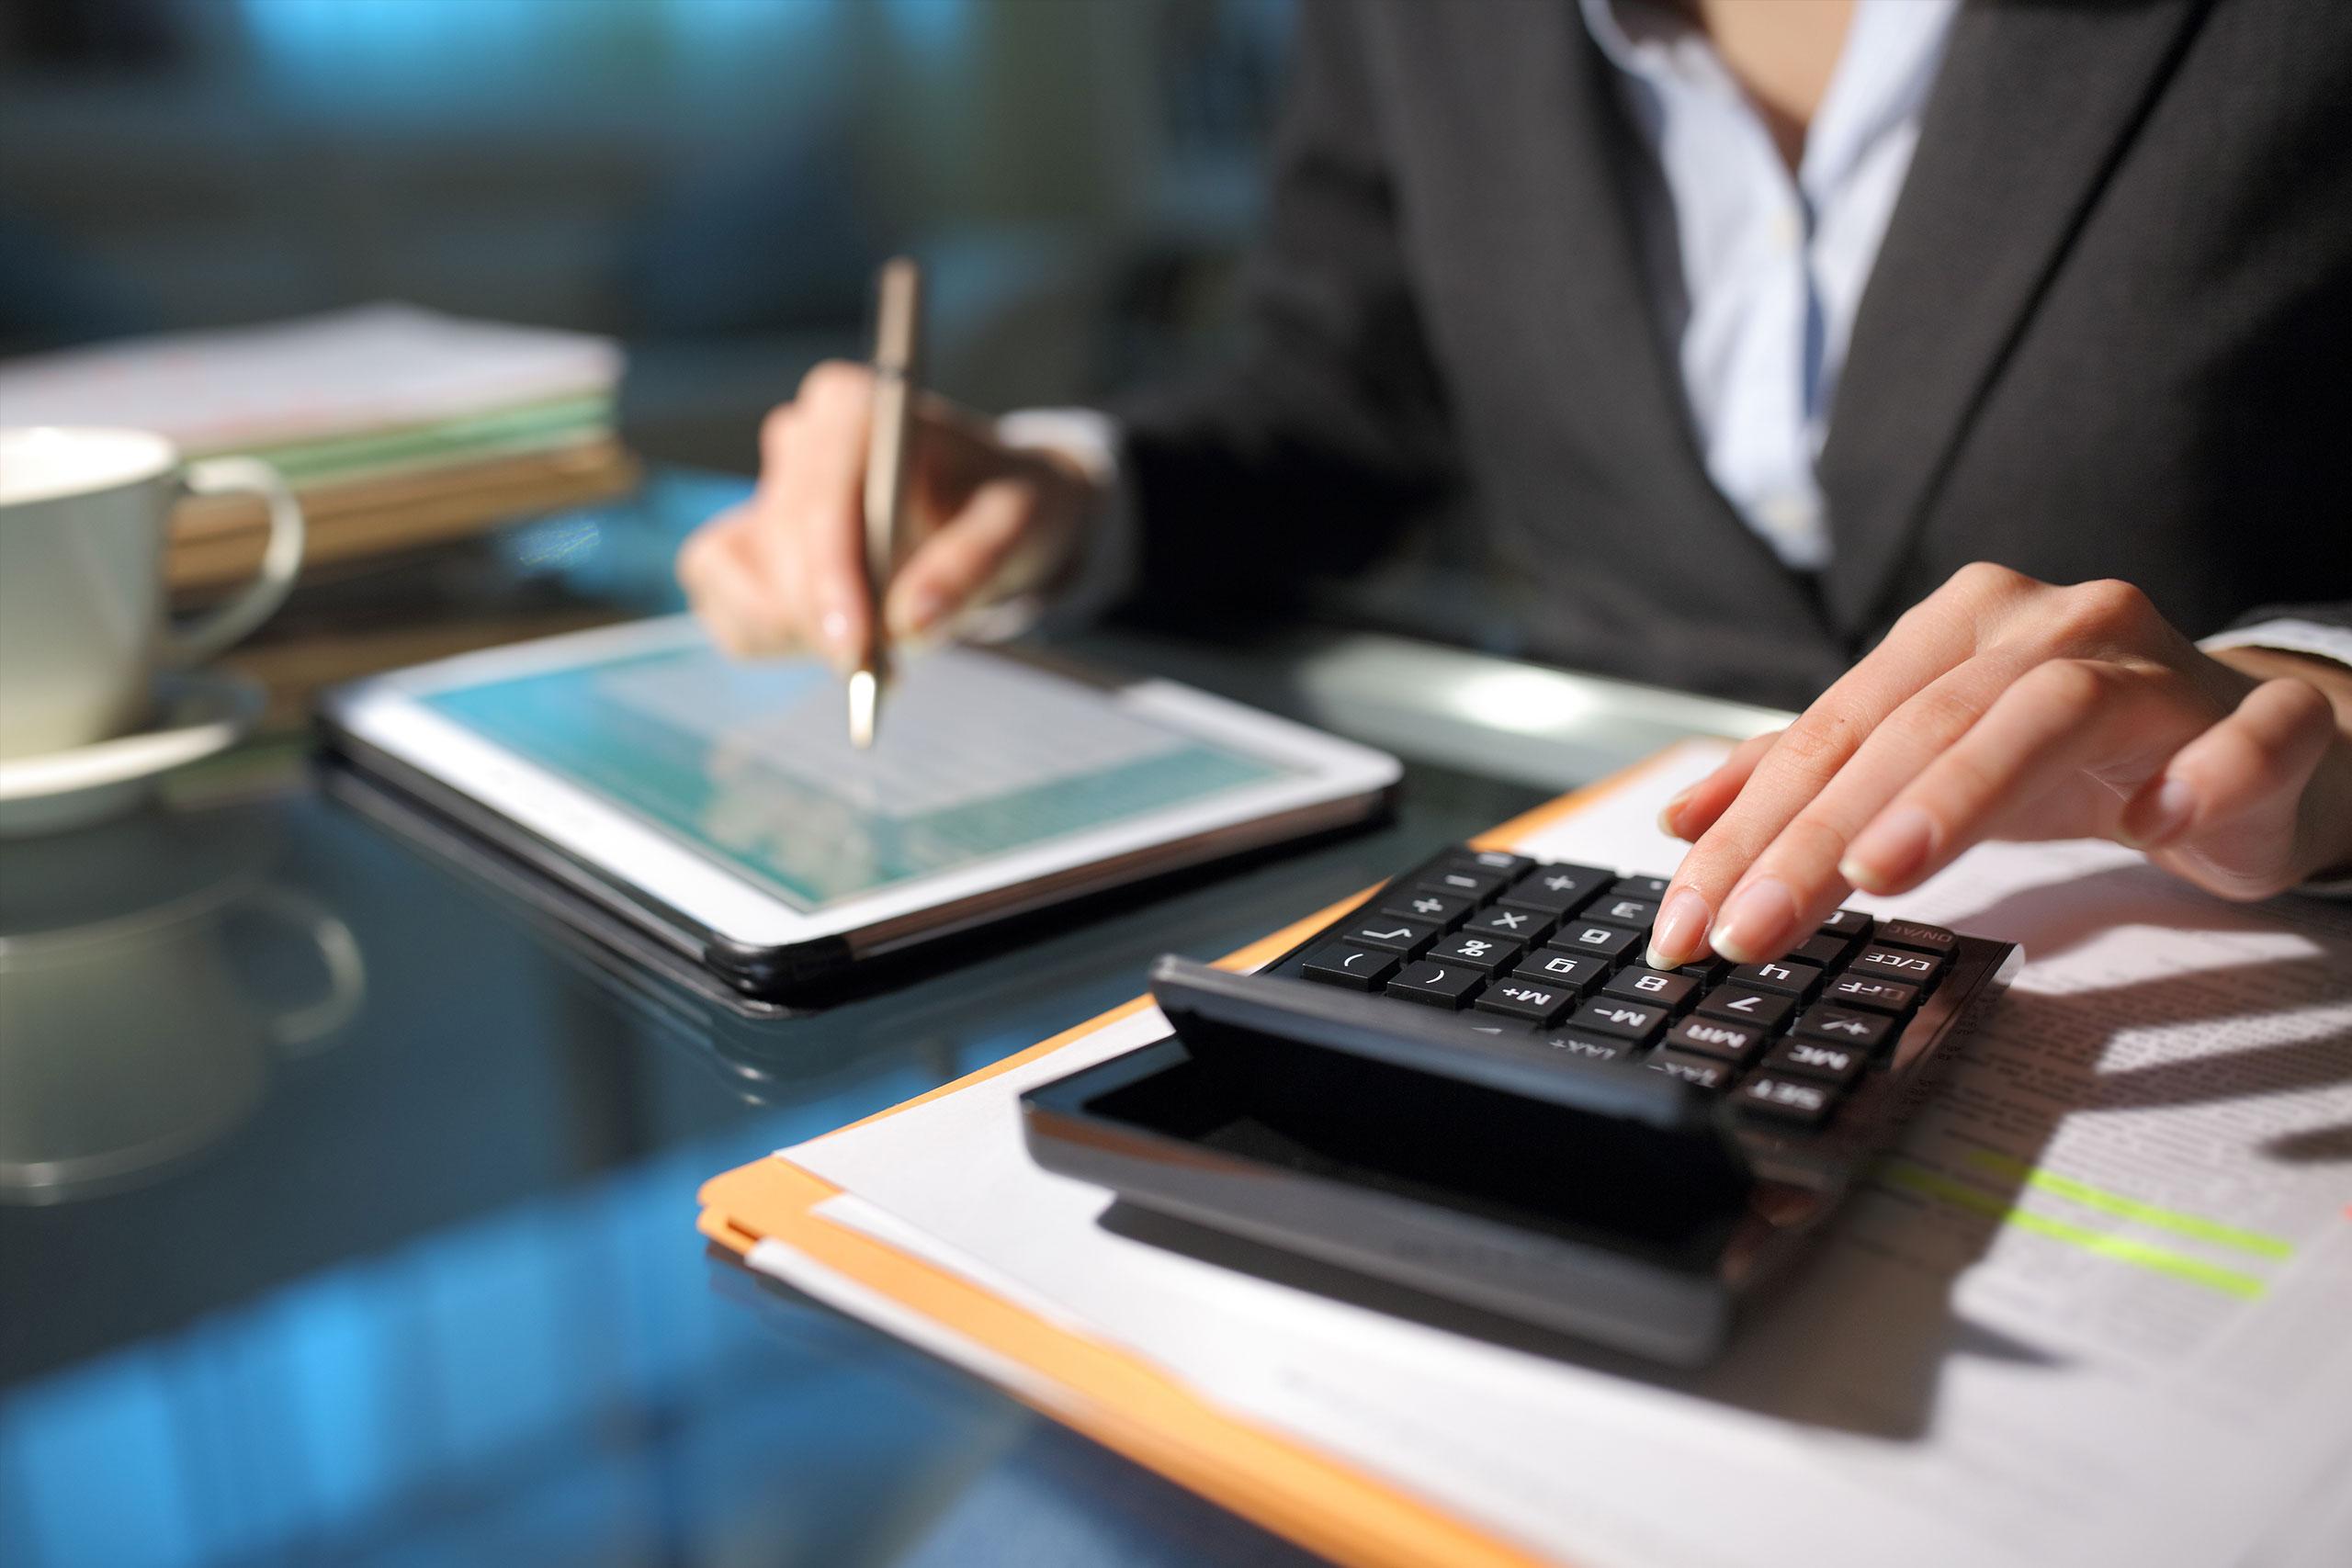 Frau Rechnungsstellung Autobooking